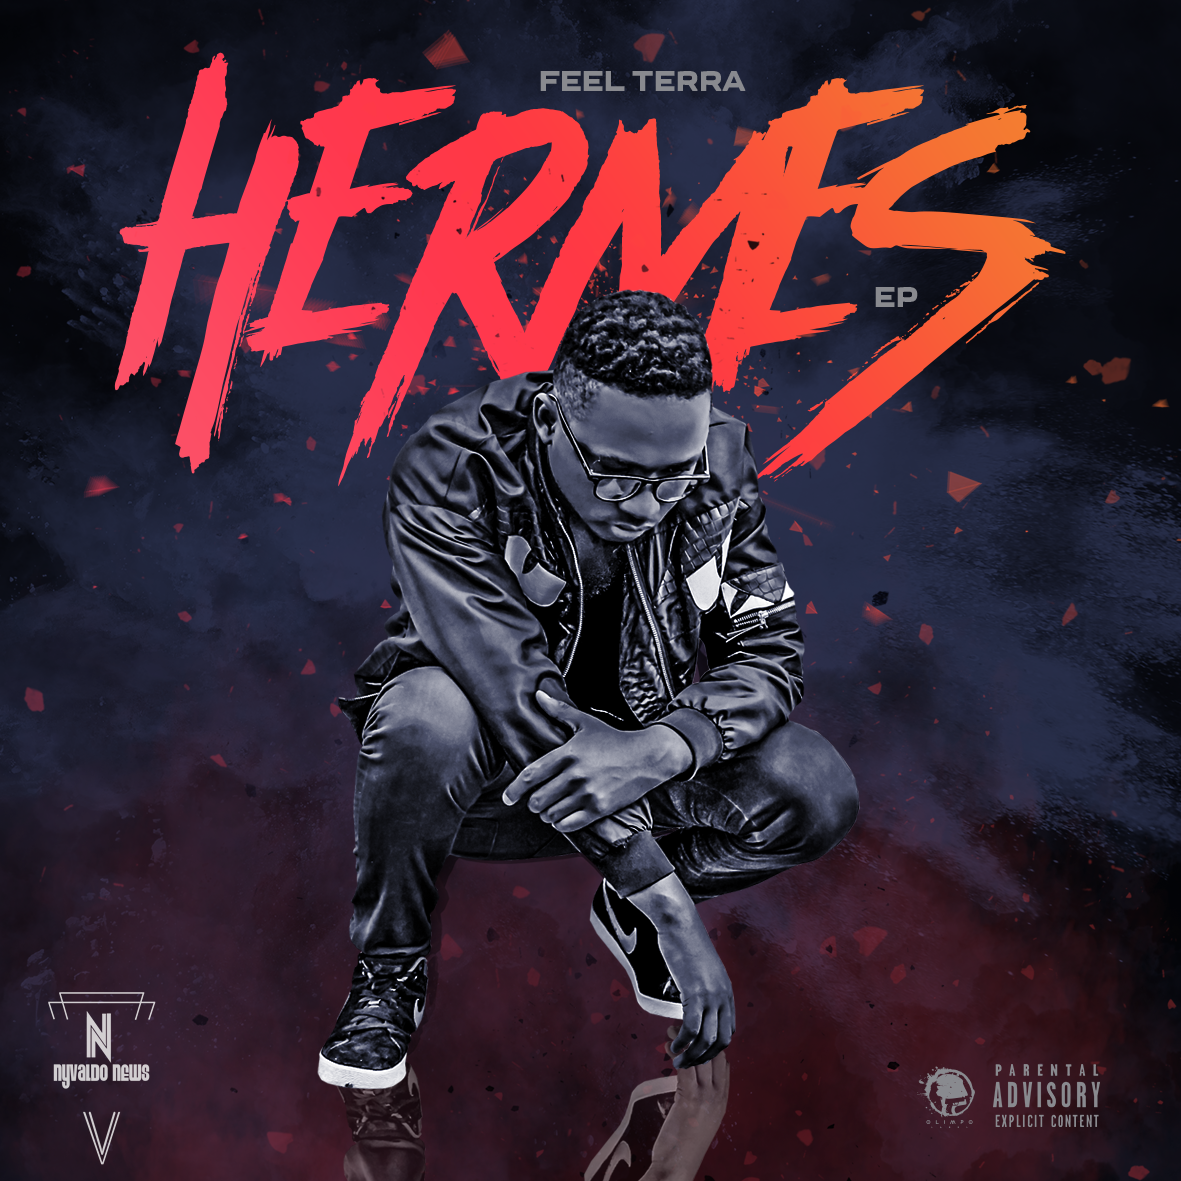 Khalid Young Dum Mp3: Feel Terra-Marcia Feat Pullex (Prod. Eloyme 2R Jr) (Rap